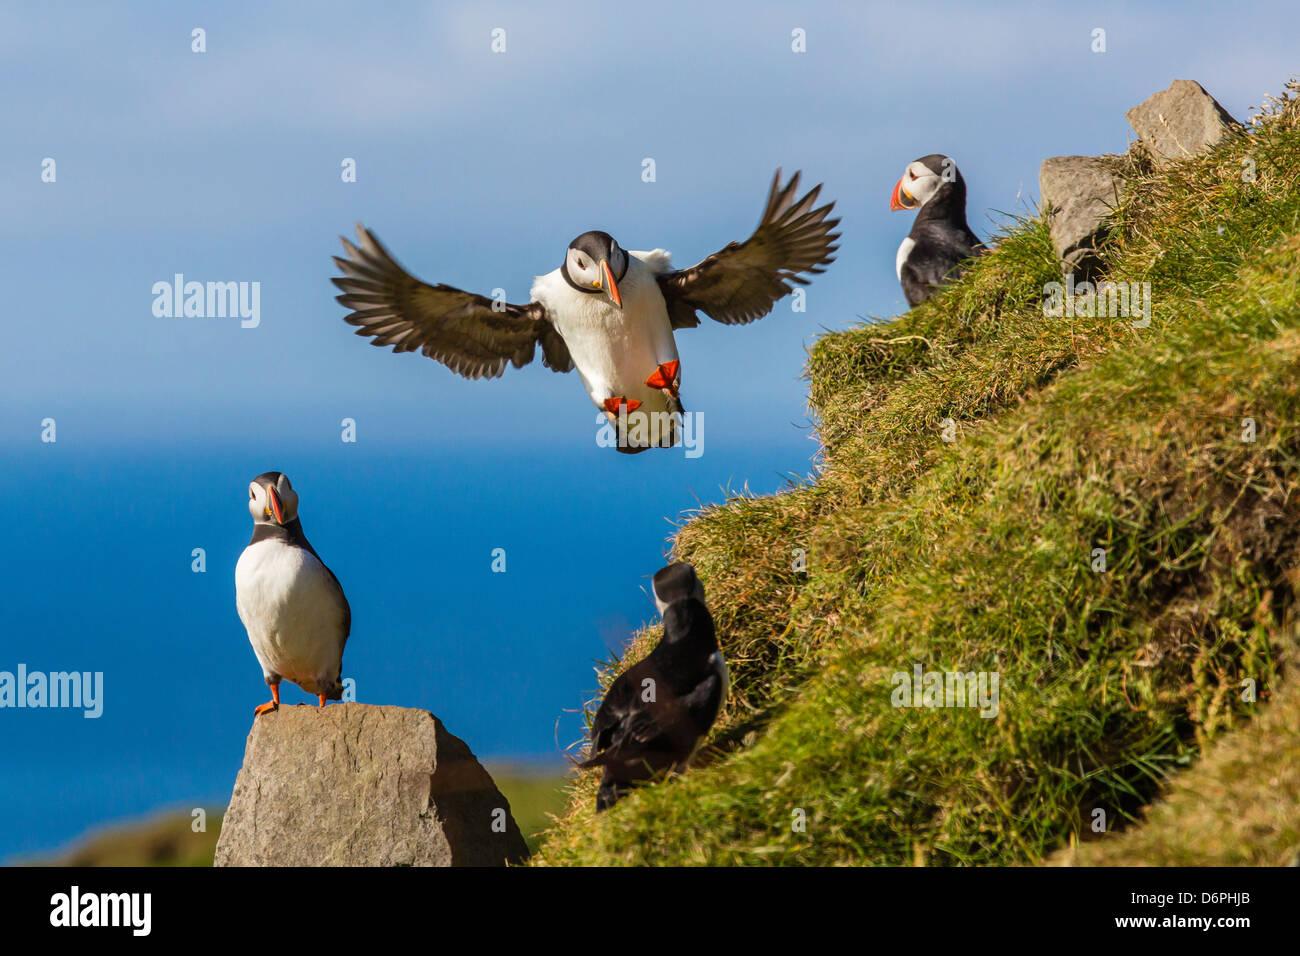 Atlantic puffins (Fratercula arctica), Mykines Island, Faroes, Denmark, Europe - Stock Image